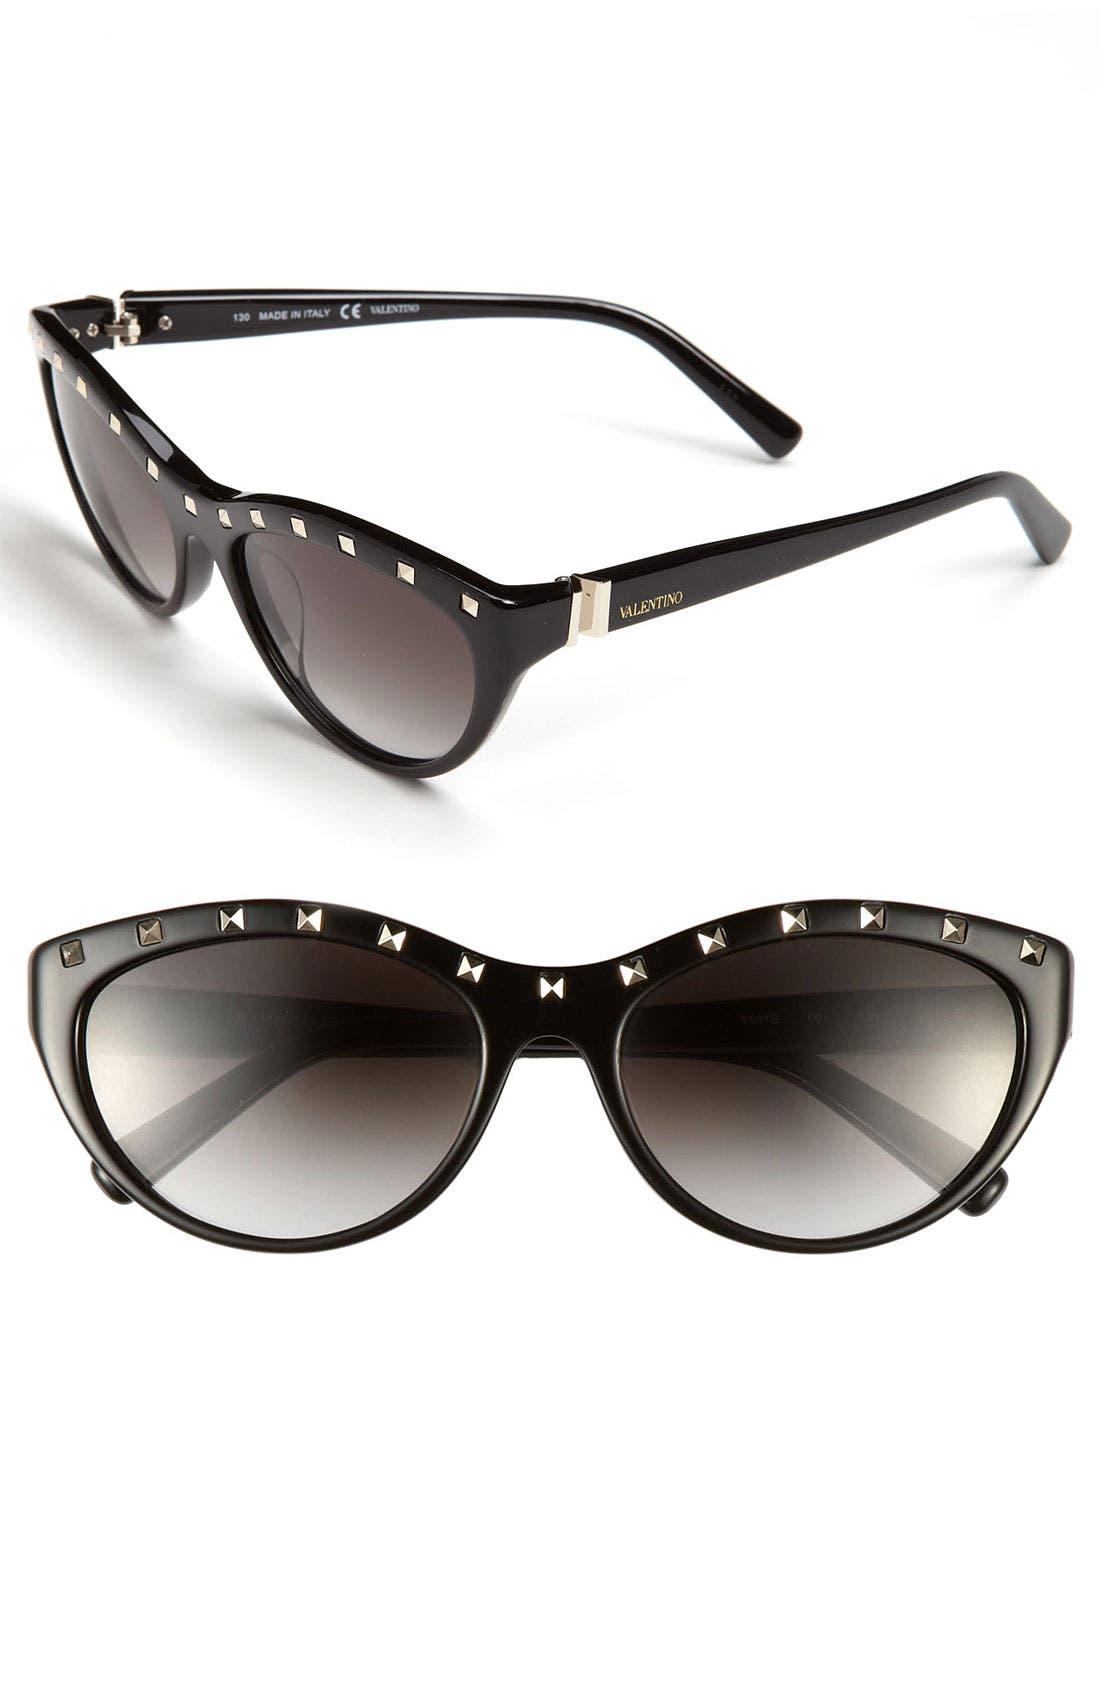 Alternate Image 1 Selected - Valentino 'Rockstud' 54mm Cat Eye Sunglasses